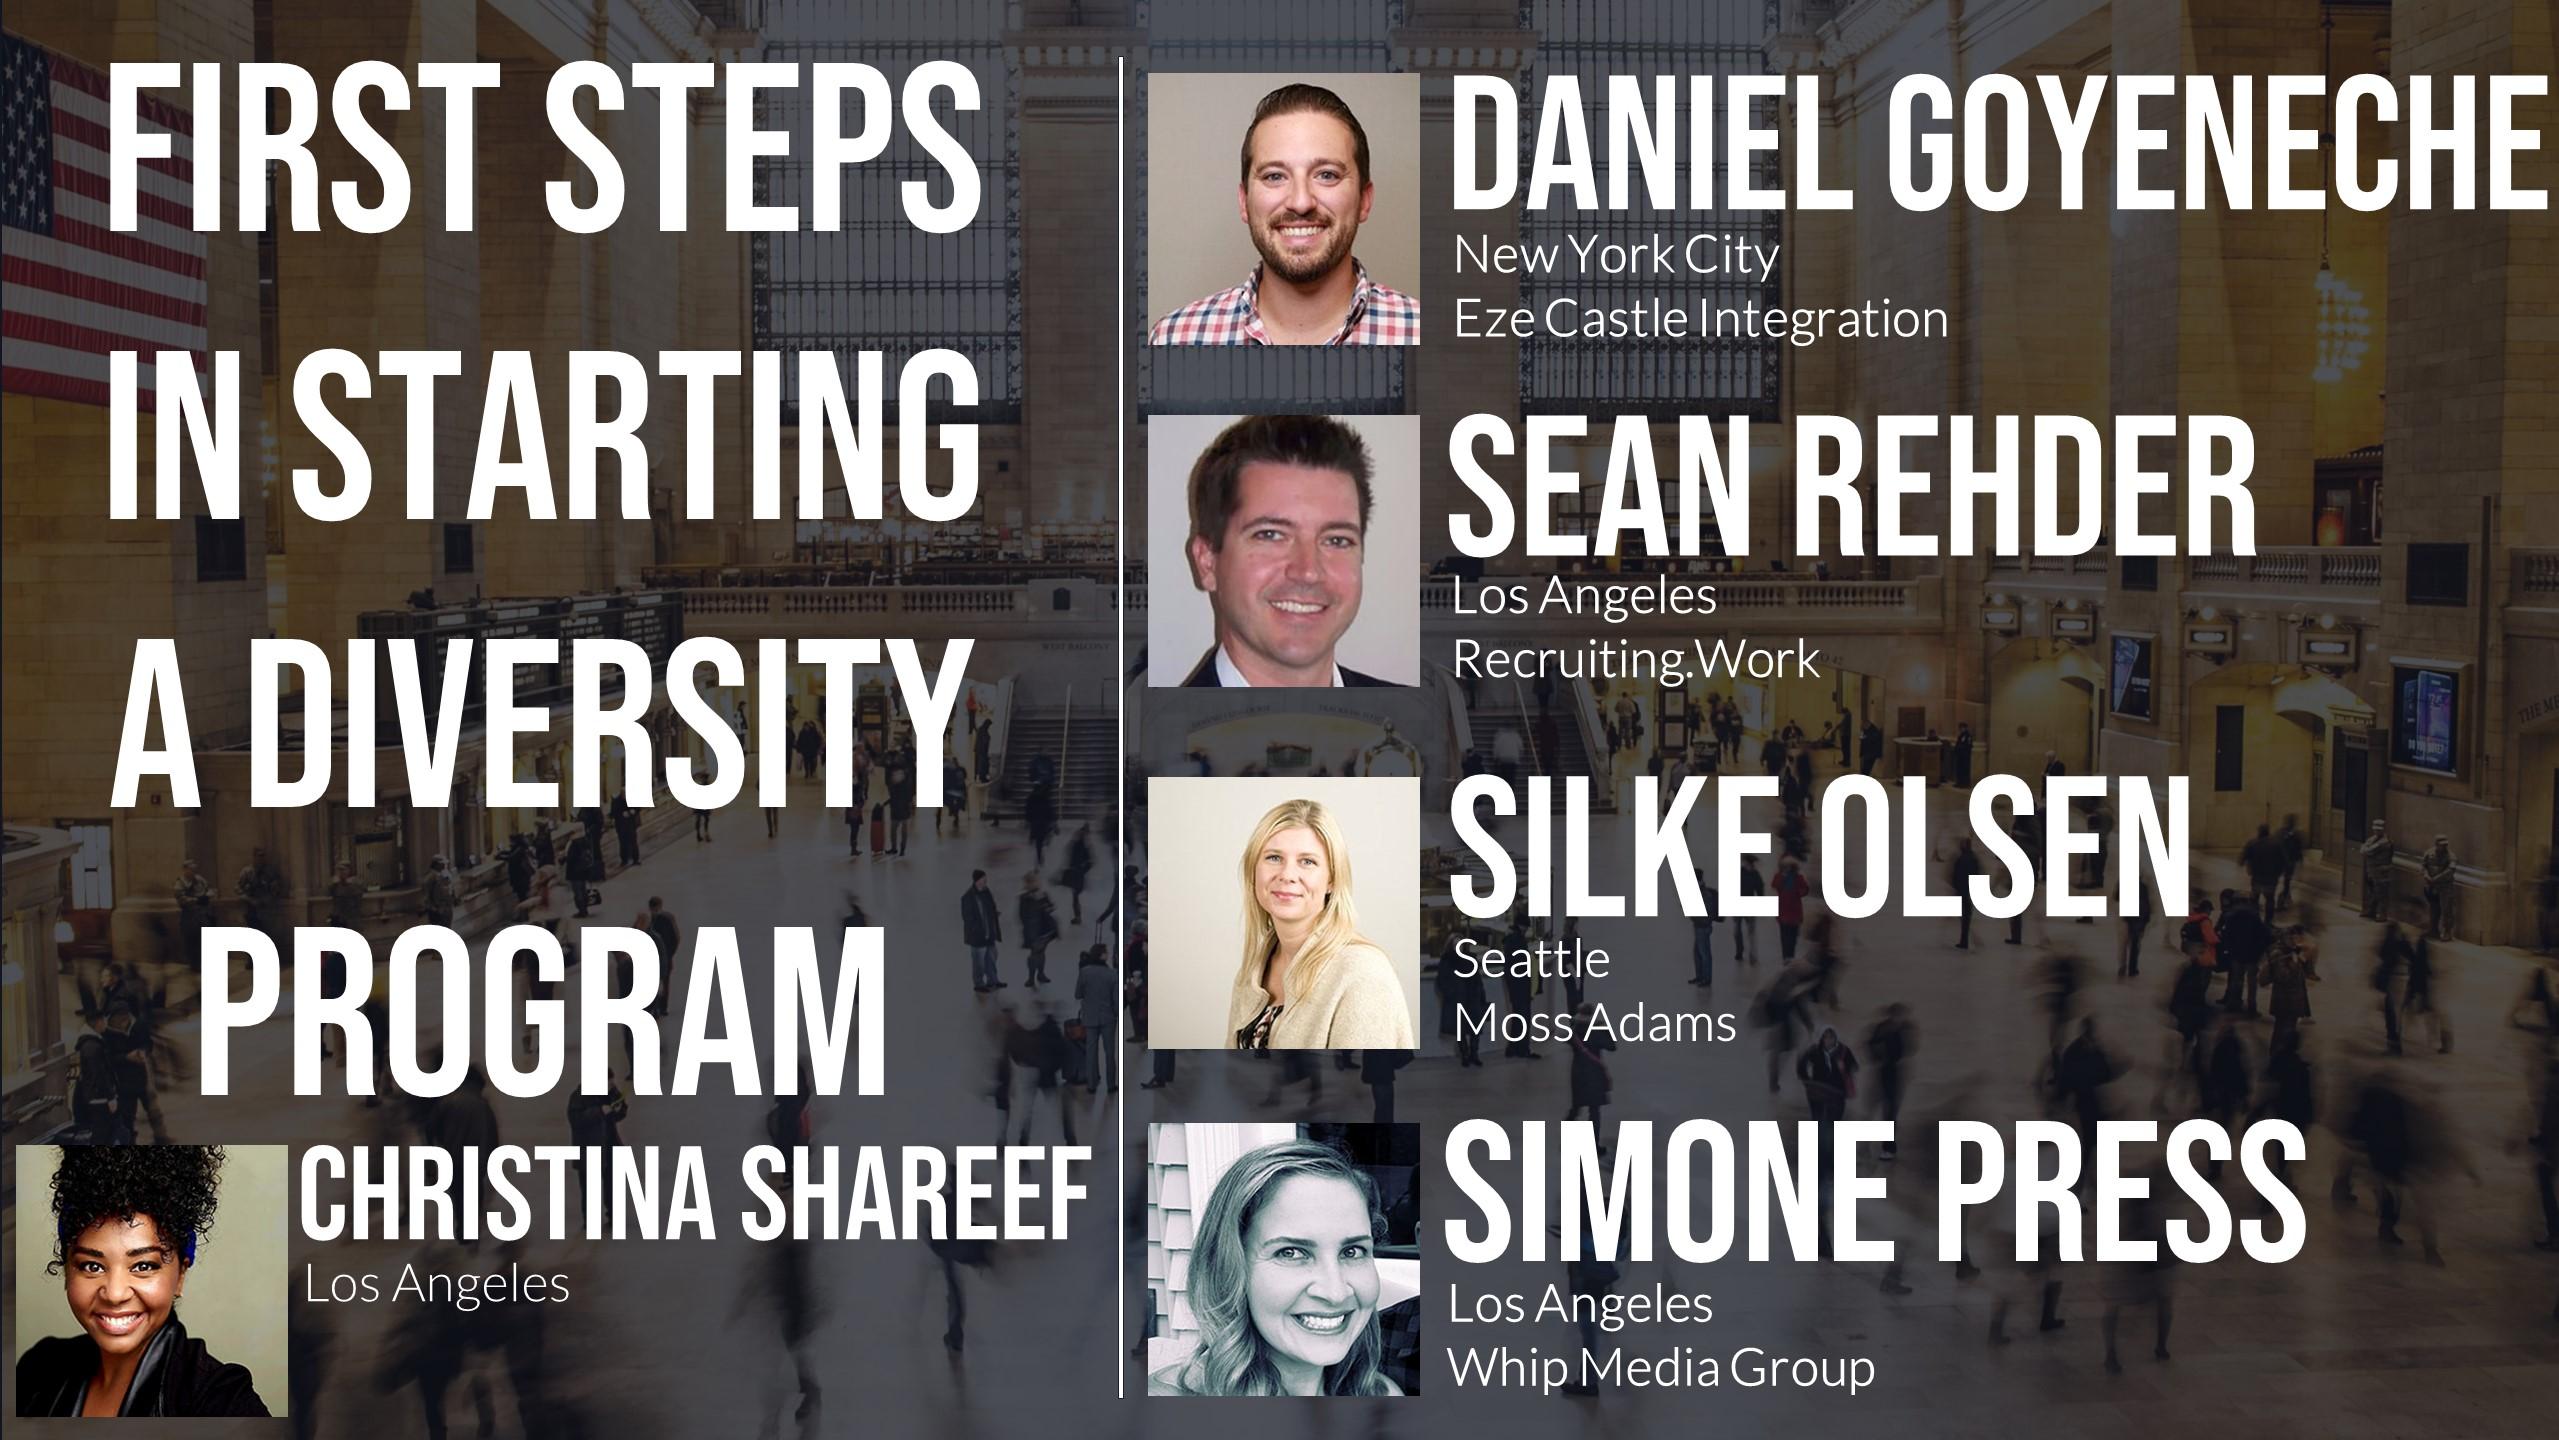 First Steps in Starting a Diversity Program